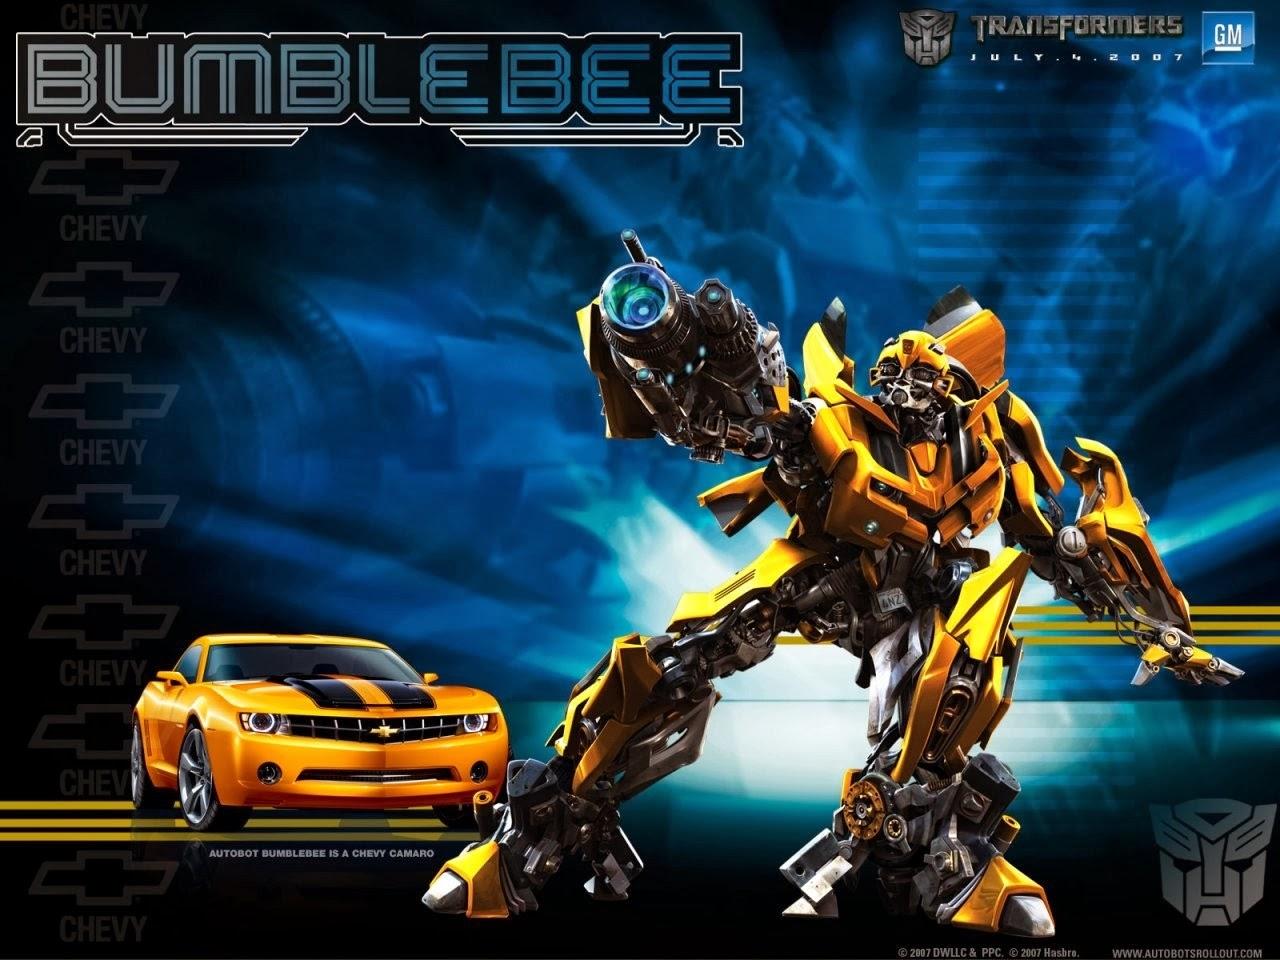 wallpaper bumblebee transformers - beauty walpaper